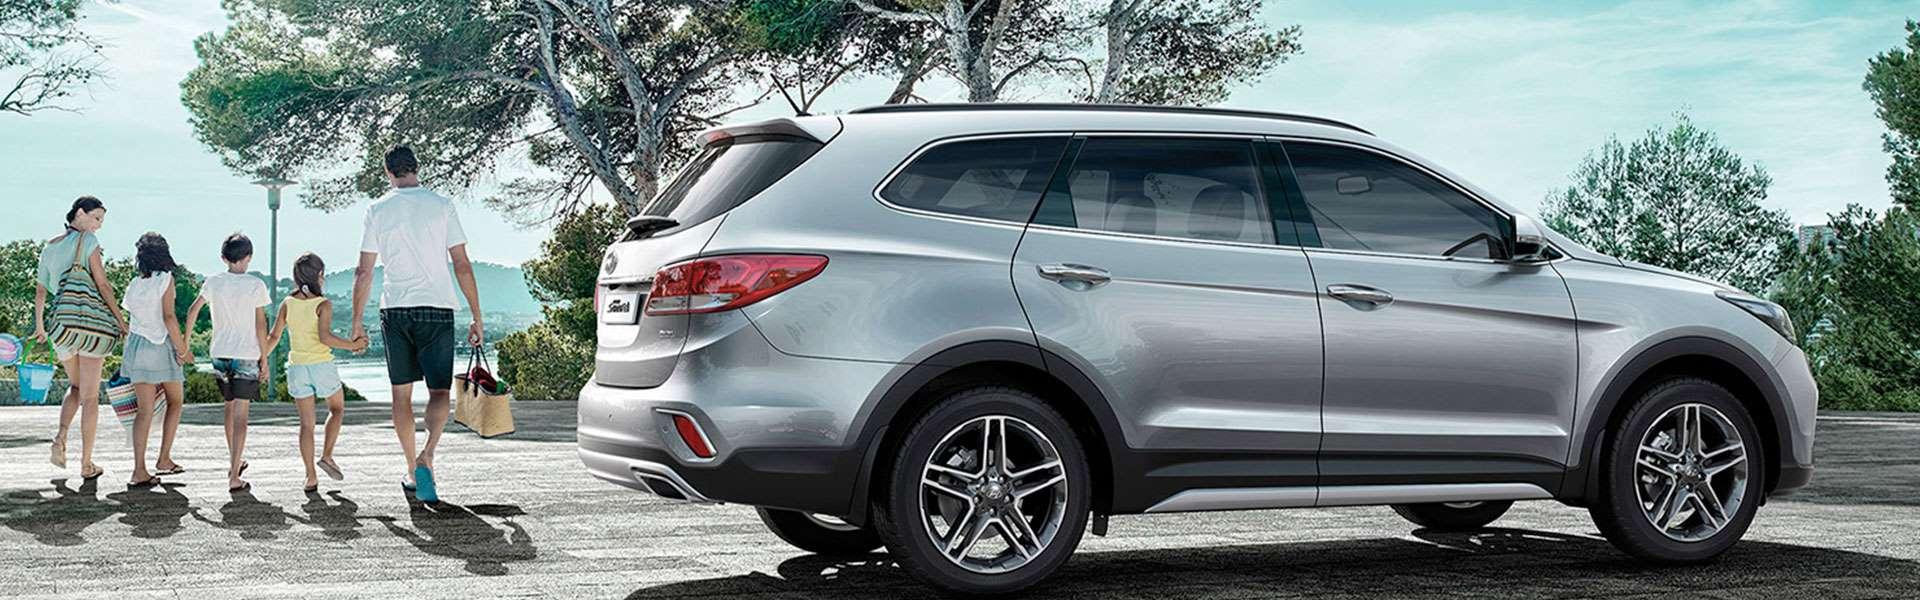 Hyundai Grand Santa Fe - обзор